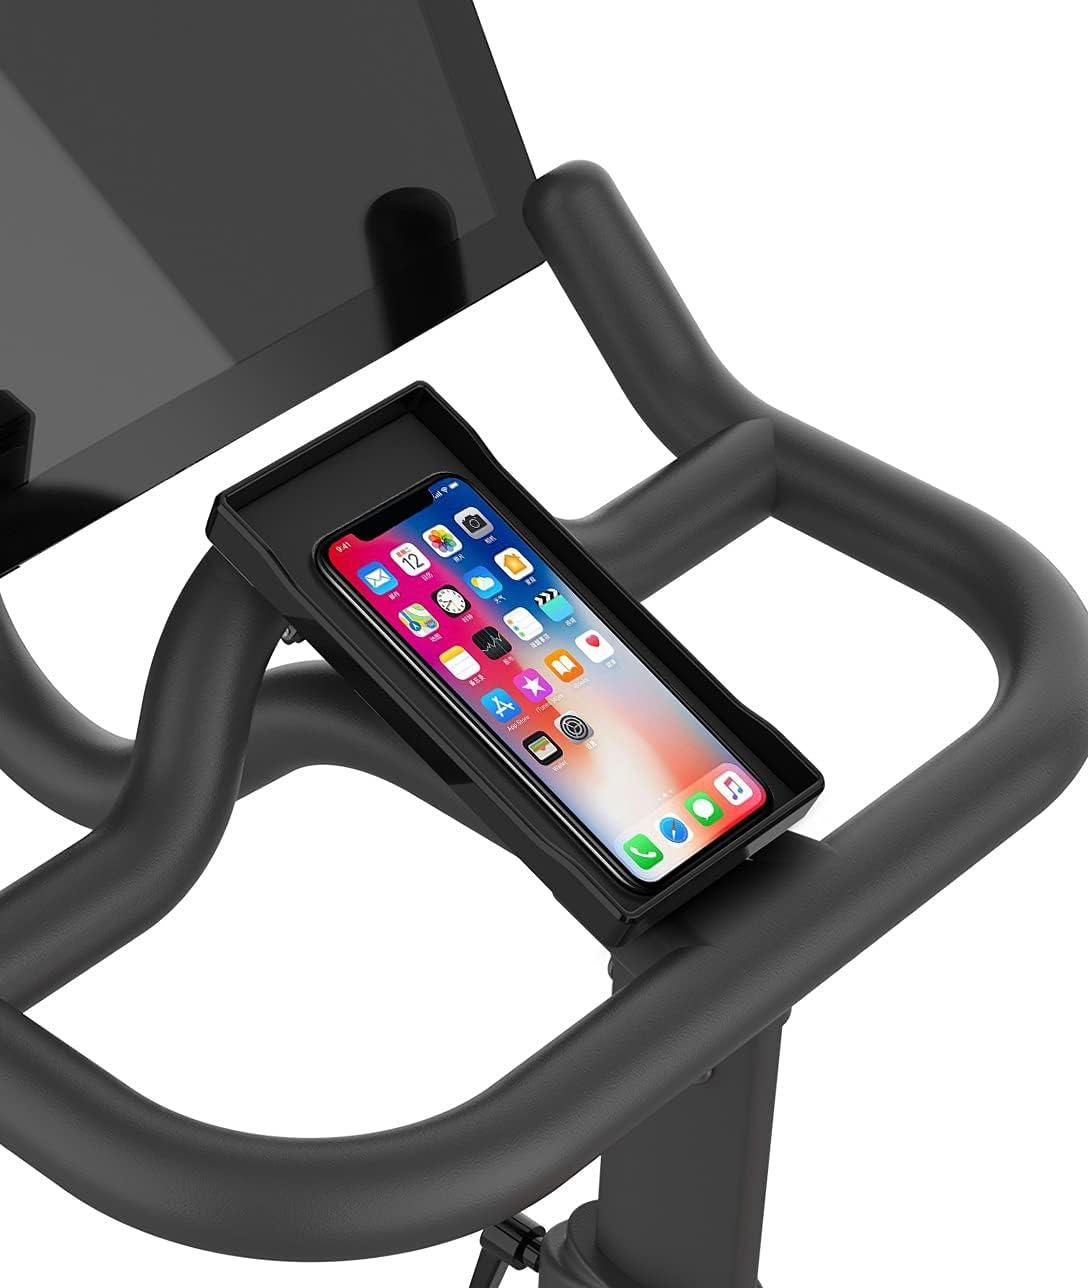 Handlebar Anti-Slippery Phone Mount Bracket Holder for Peloton Bike and Peloton Bike +, Bike Phone Mount for Peloton Accessories Stand on Handlebar